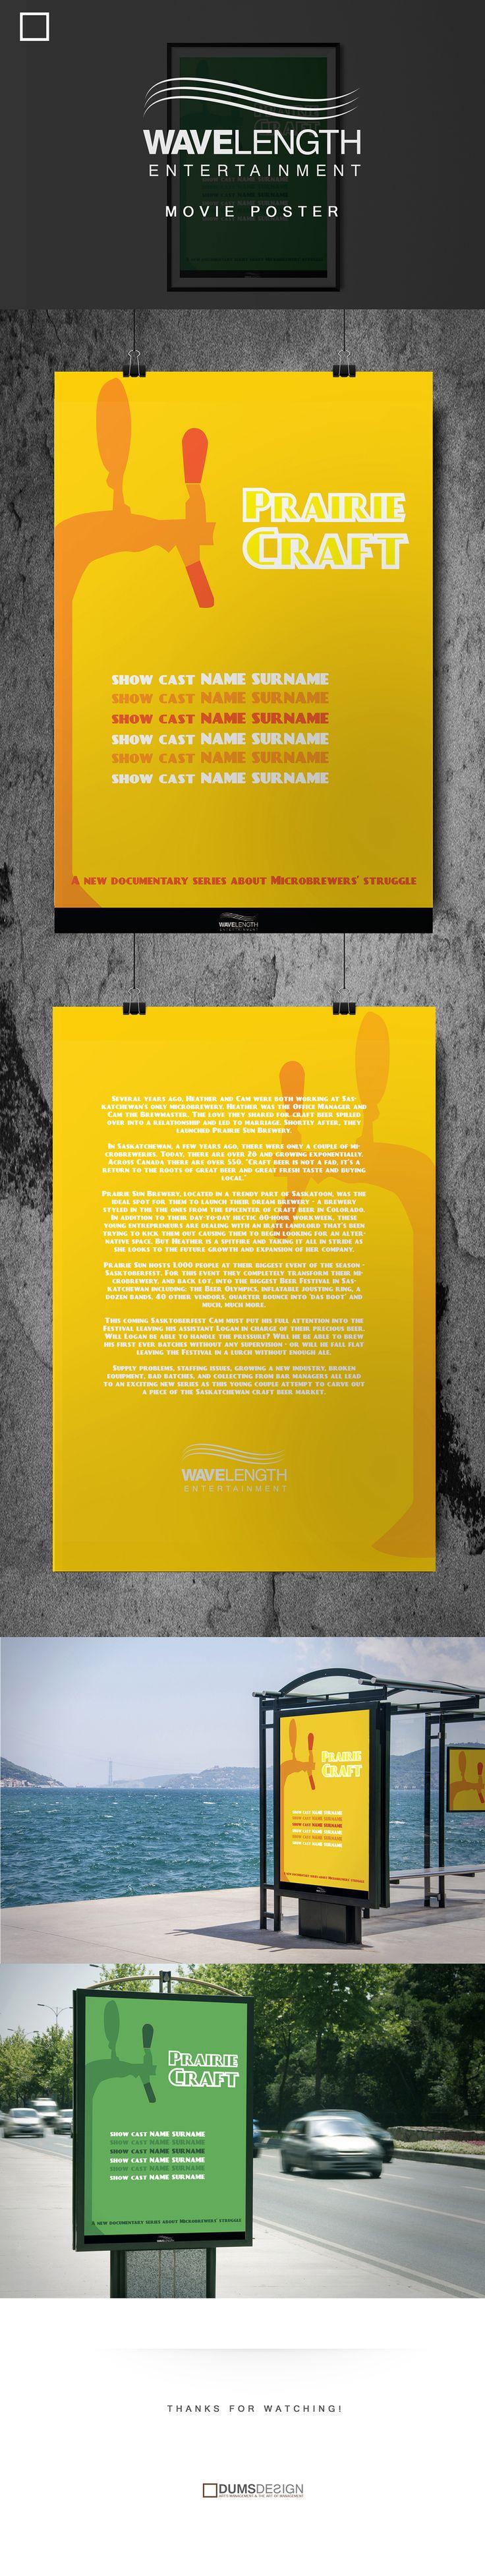 Wavelenght Entertainment - Poster Design on Behance